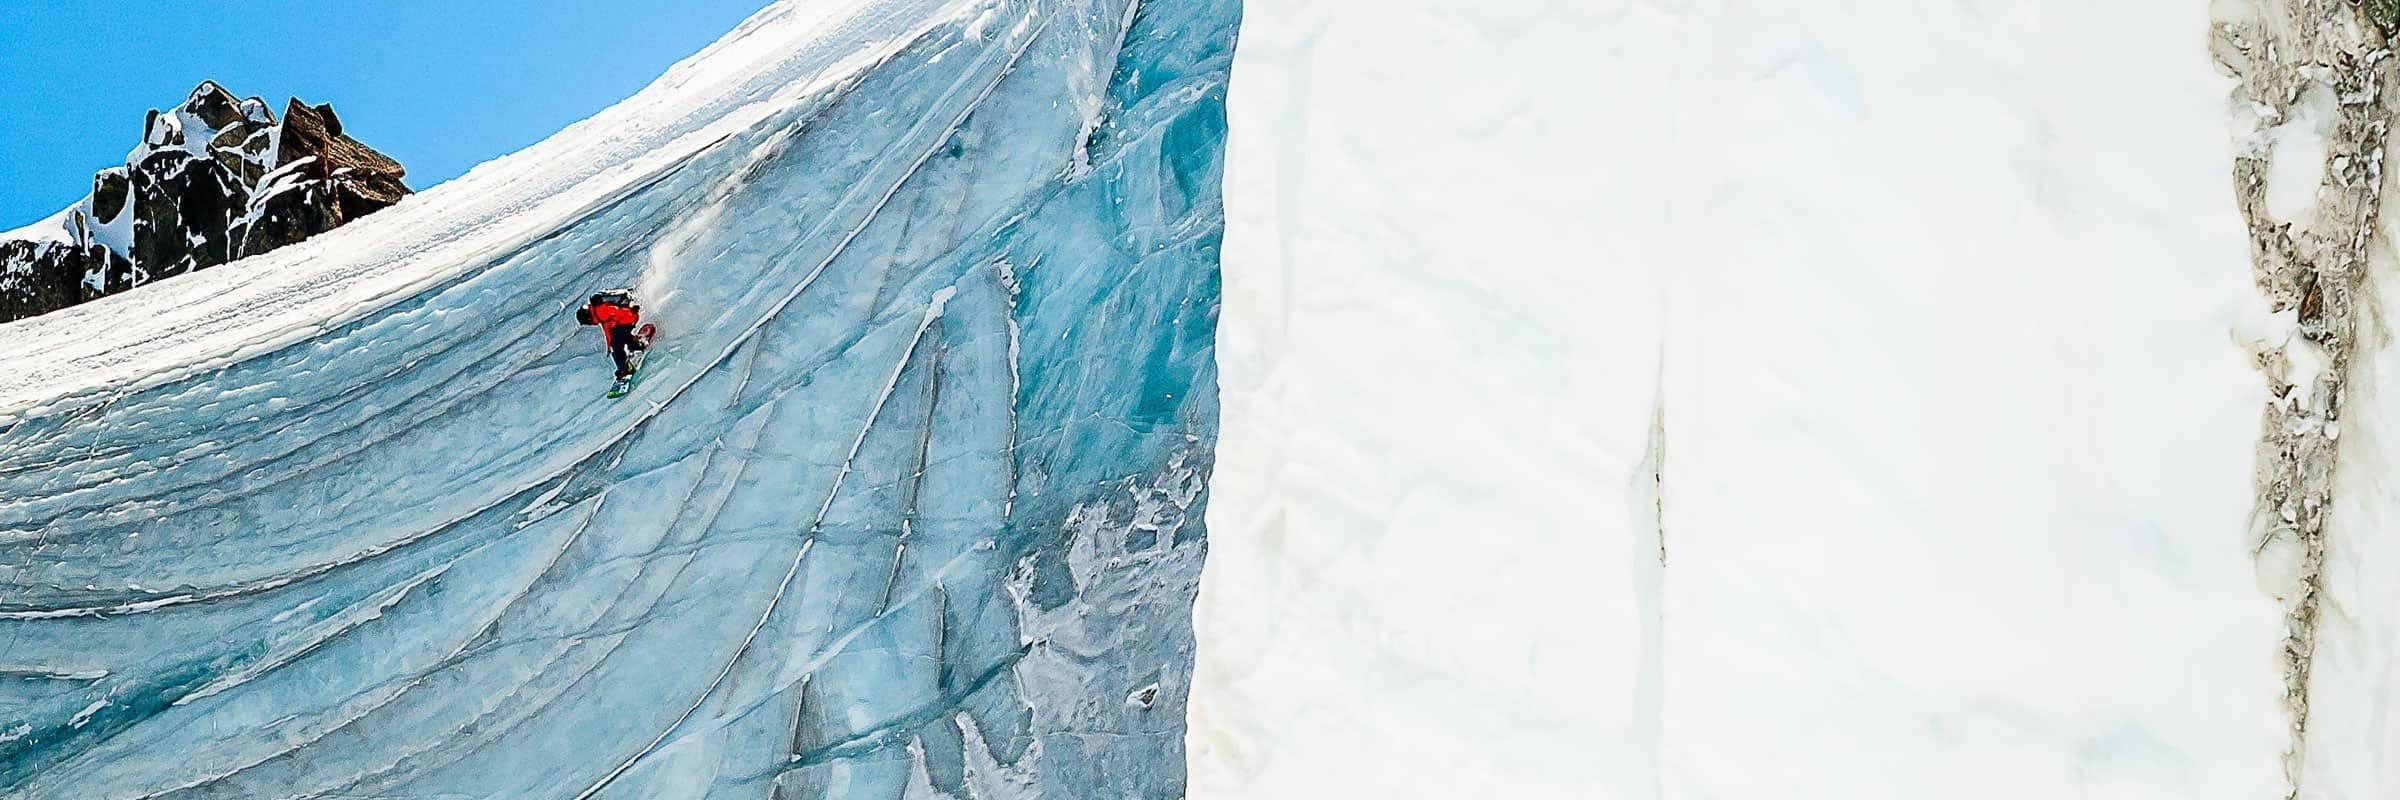 The North Face. The North Face Steep Series : Un ensemble. Toutes les aventures.